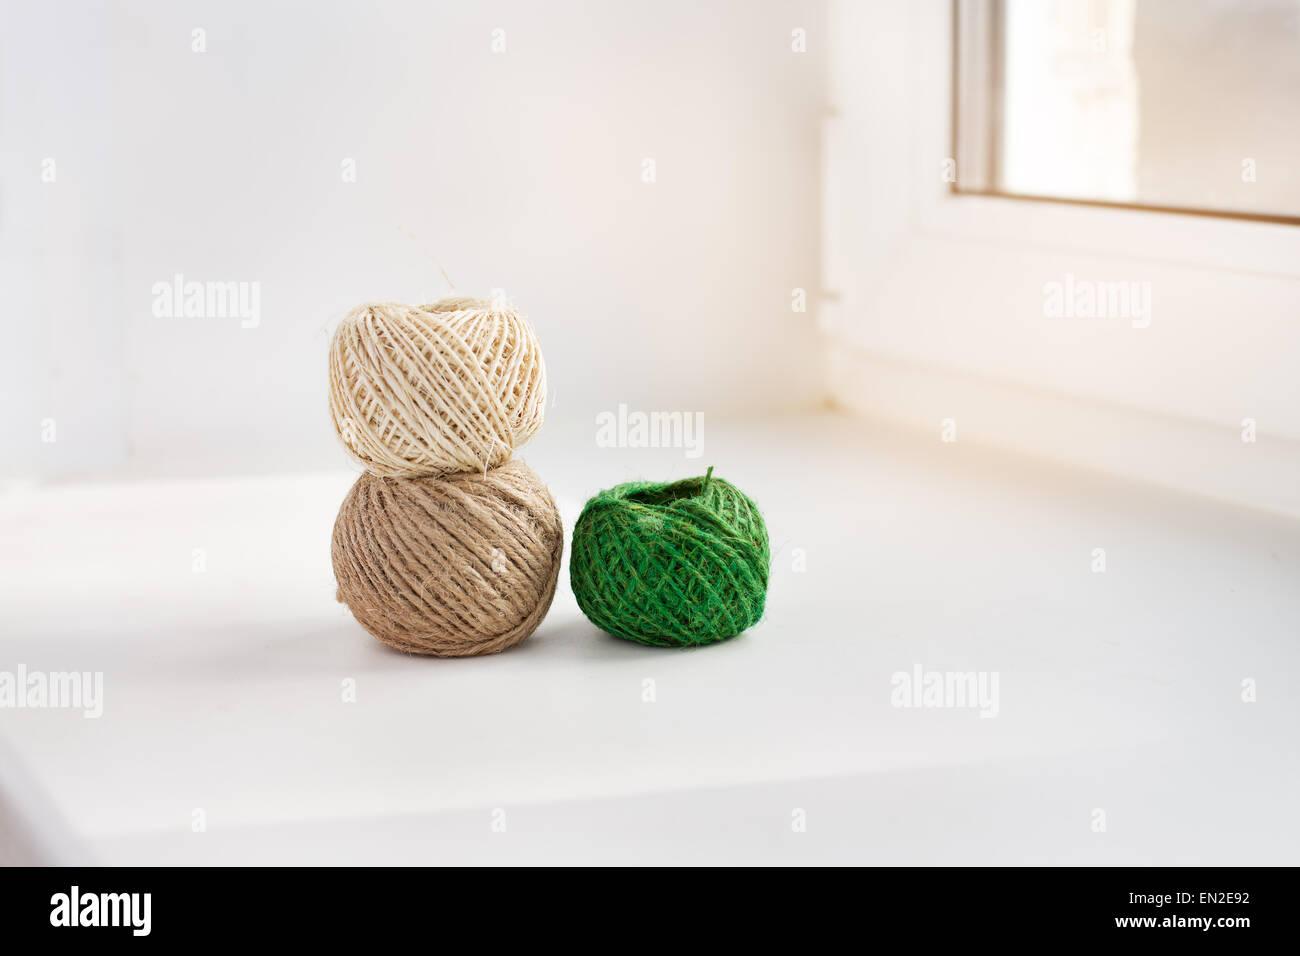 Three skeins of thread on the windowsill - Stock Image